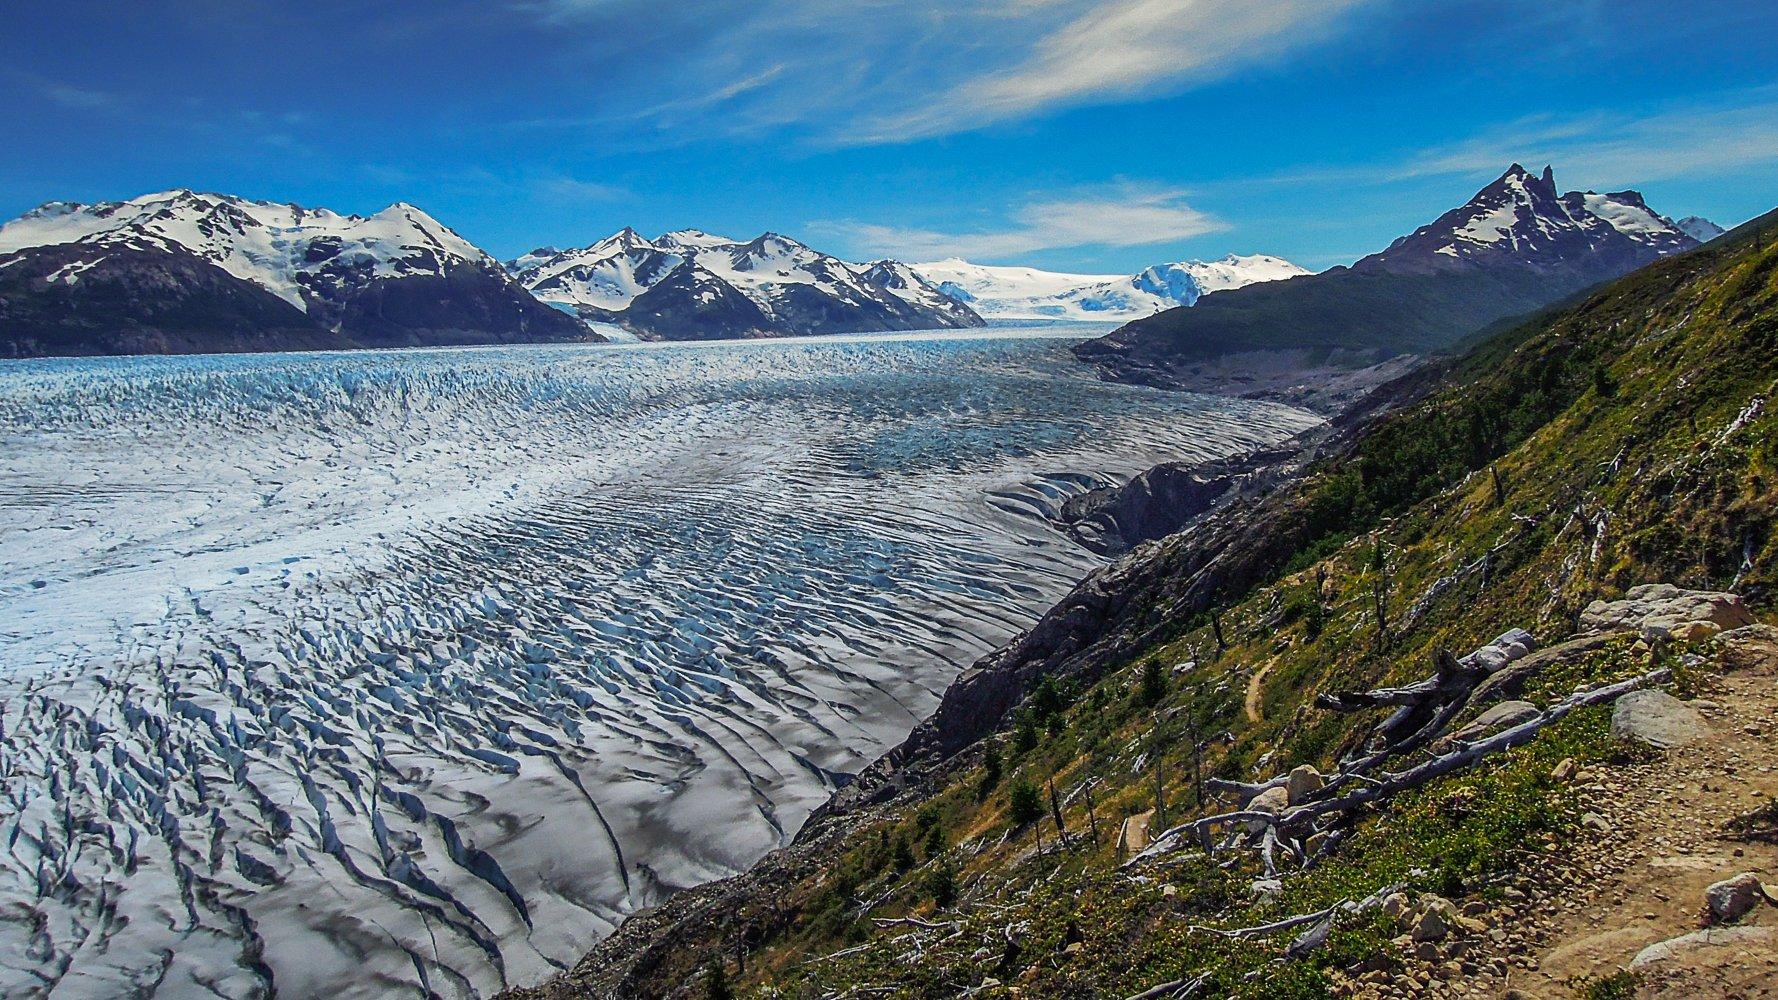 Circuito-Torri-del-Paine-ghiacciaio-Grey-trekking-circuito-o